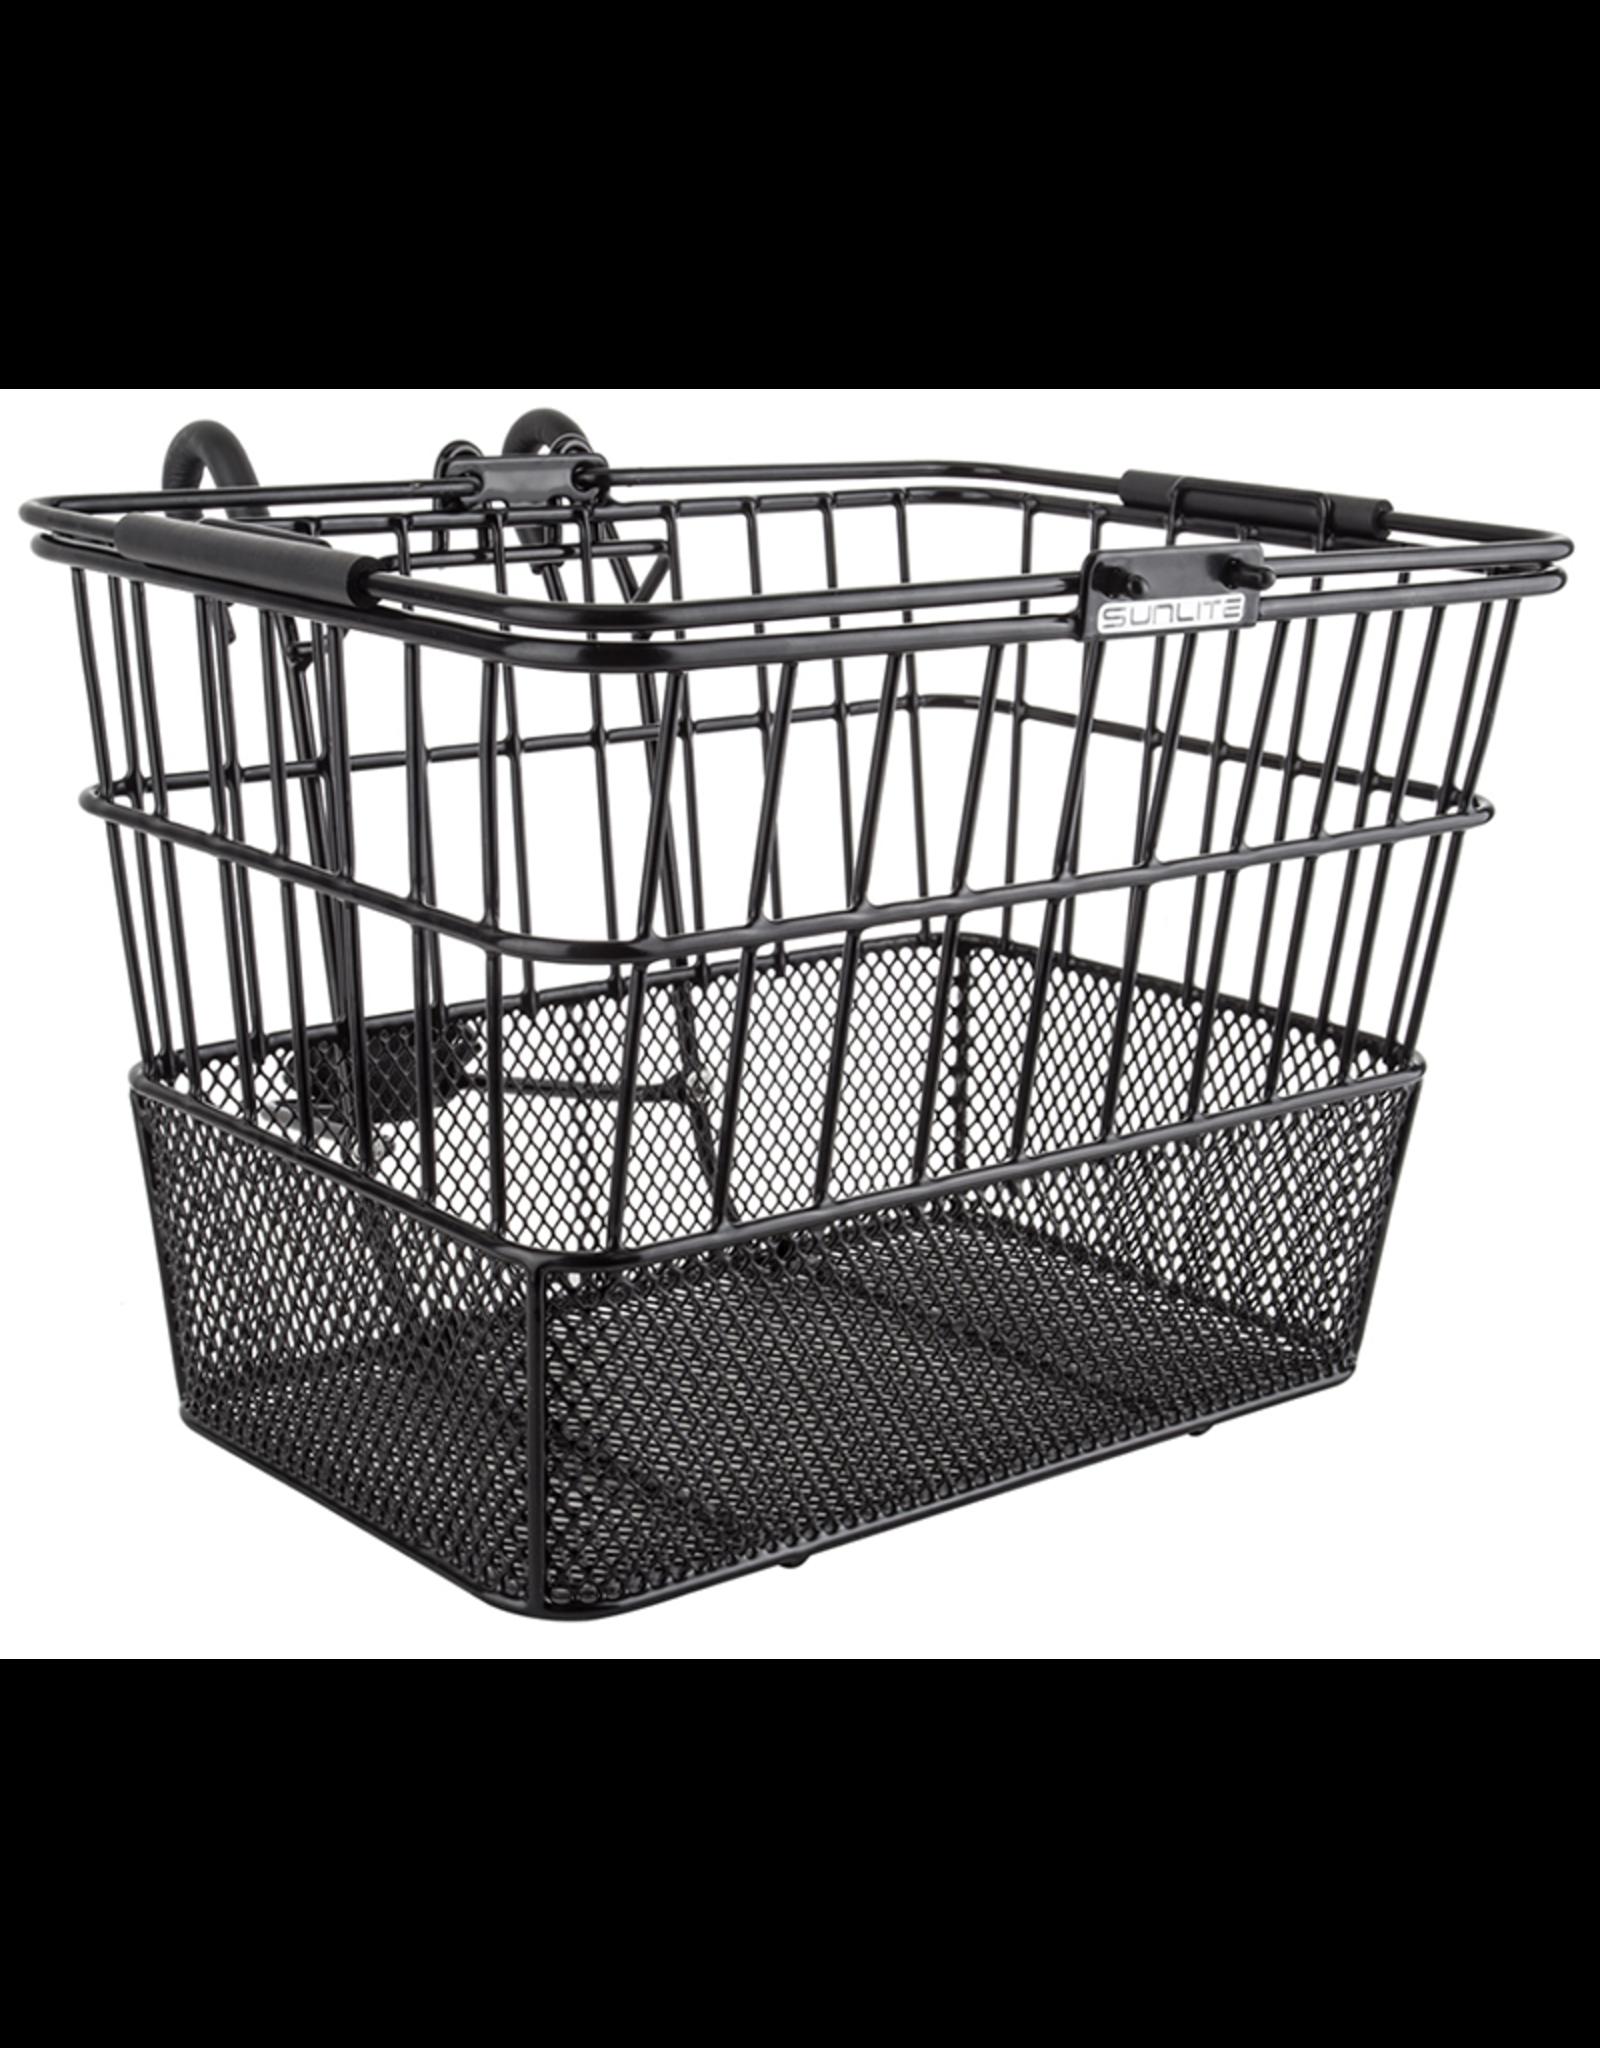 SUNLITE Front Basket: Wire Mesh Lift Off: Black